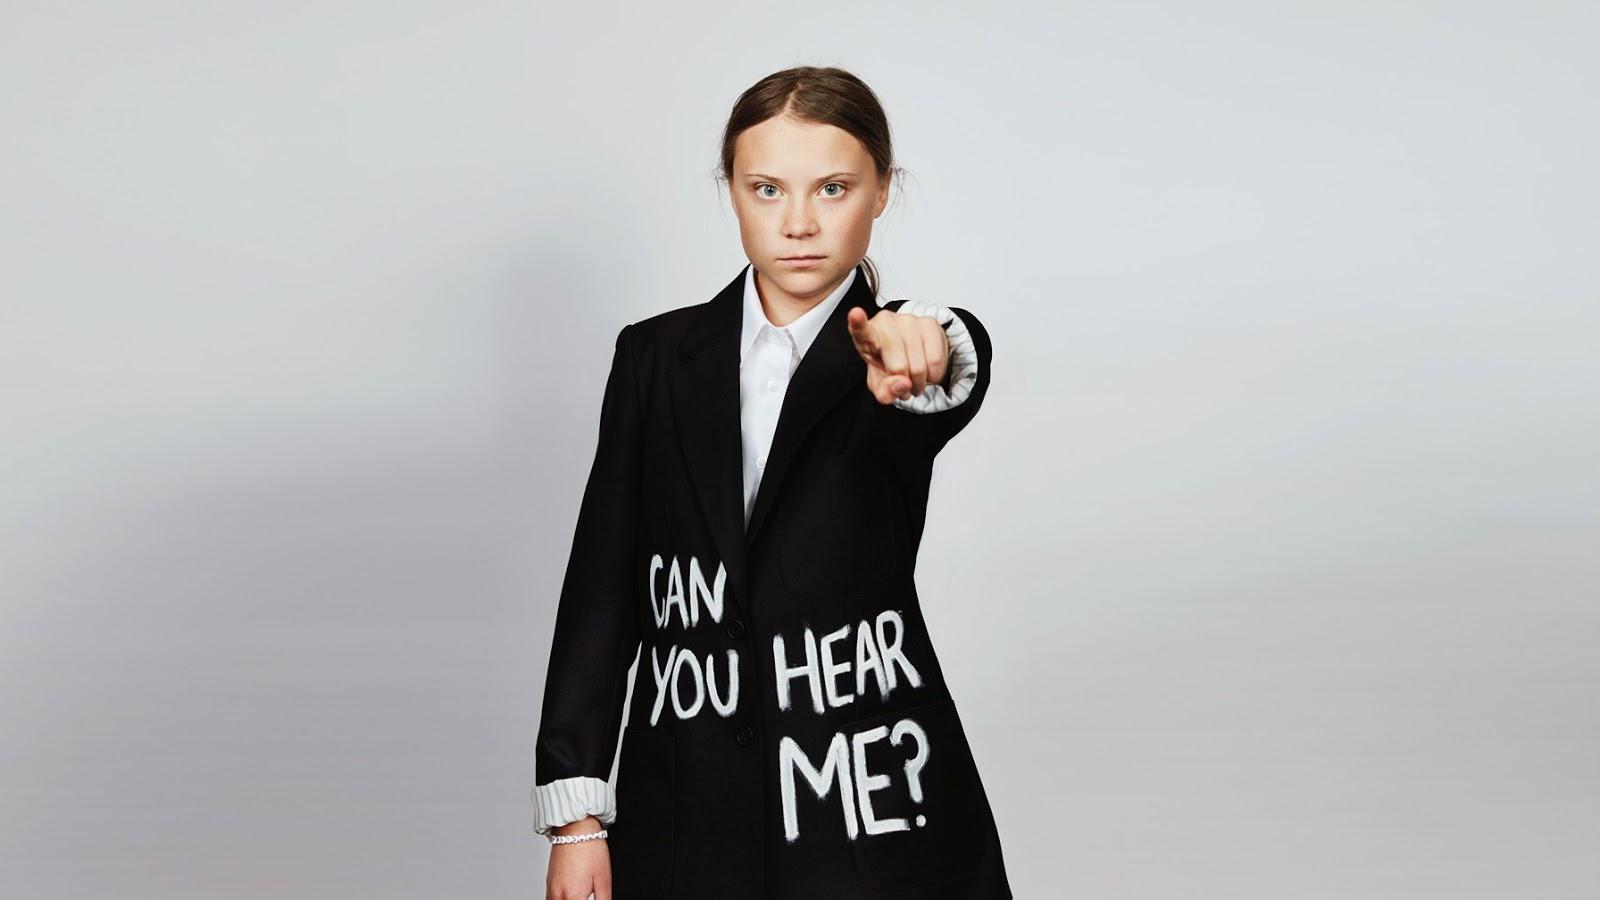 Navegando Por Aí: Greta Thunberg perturba o patriarcado